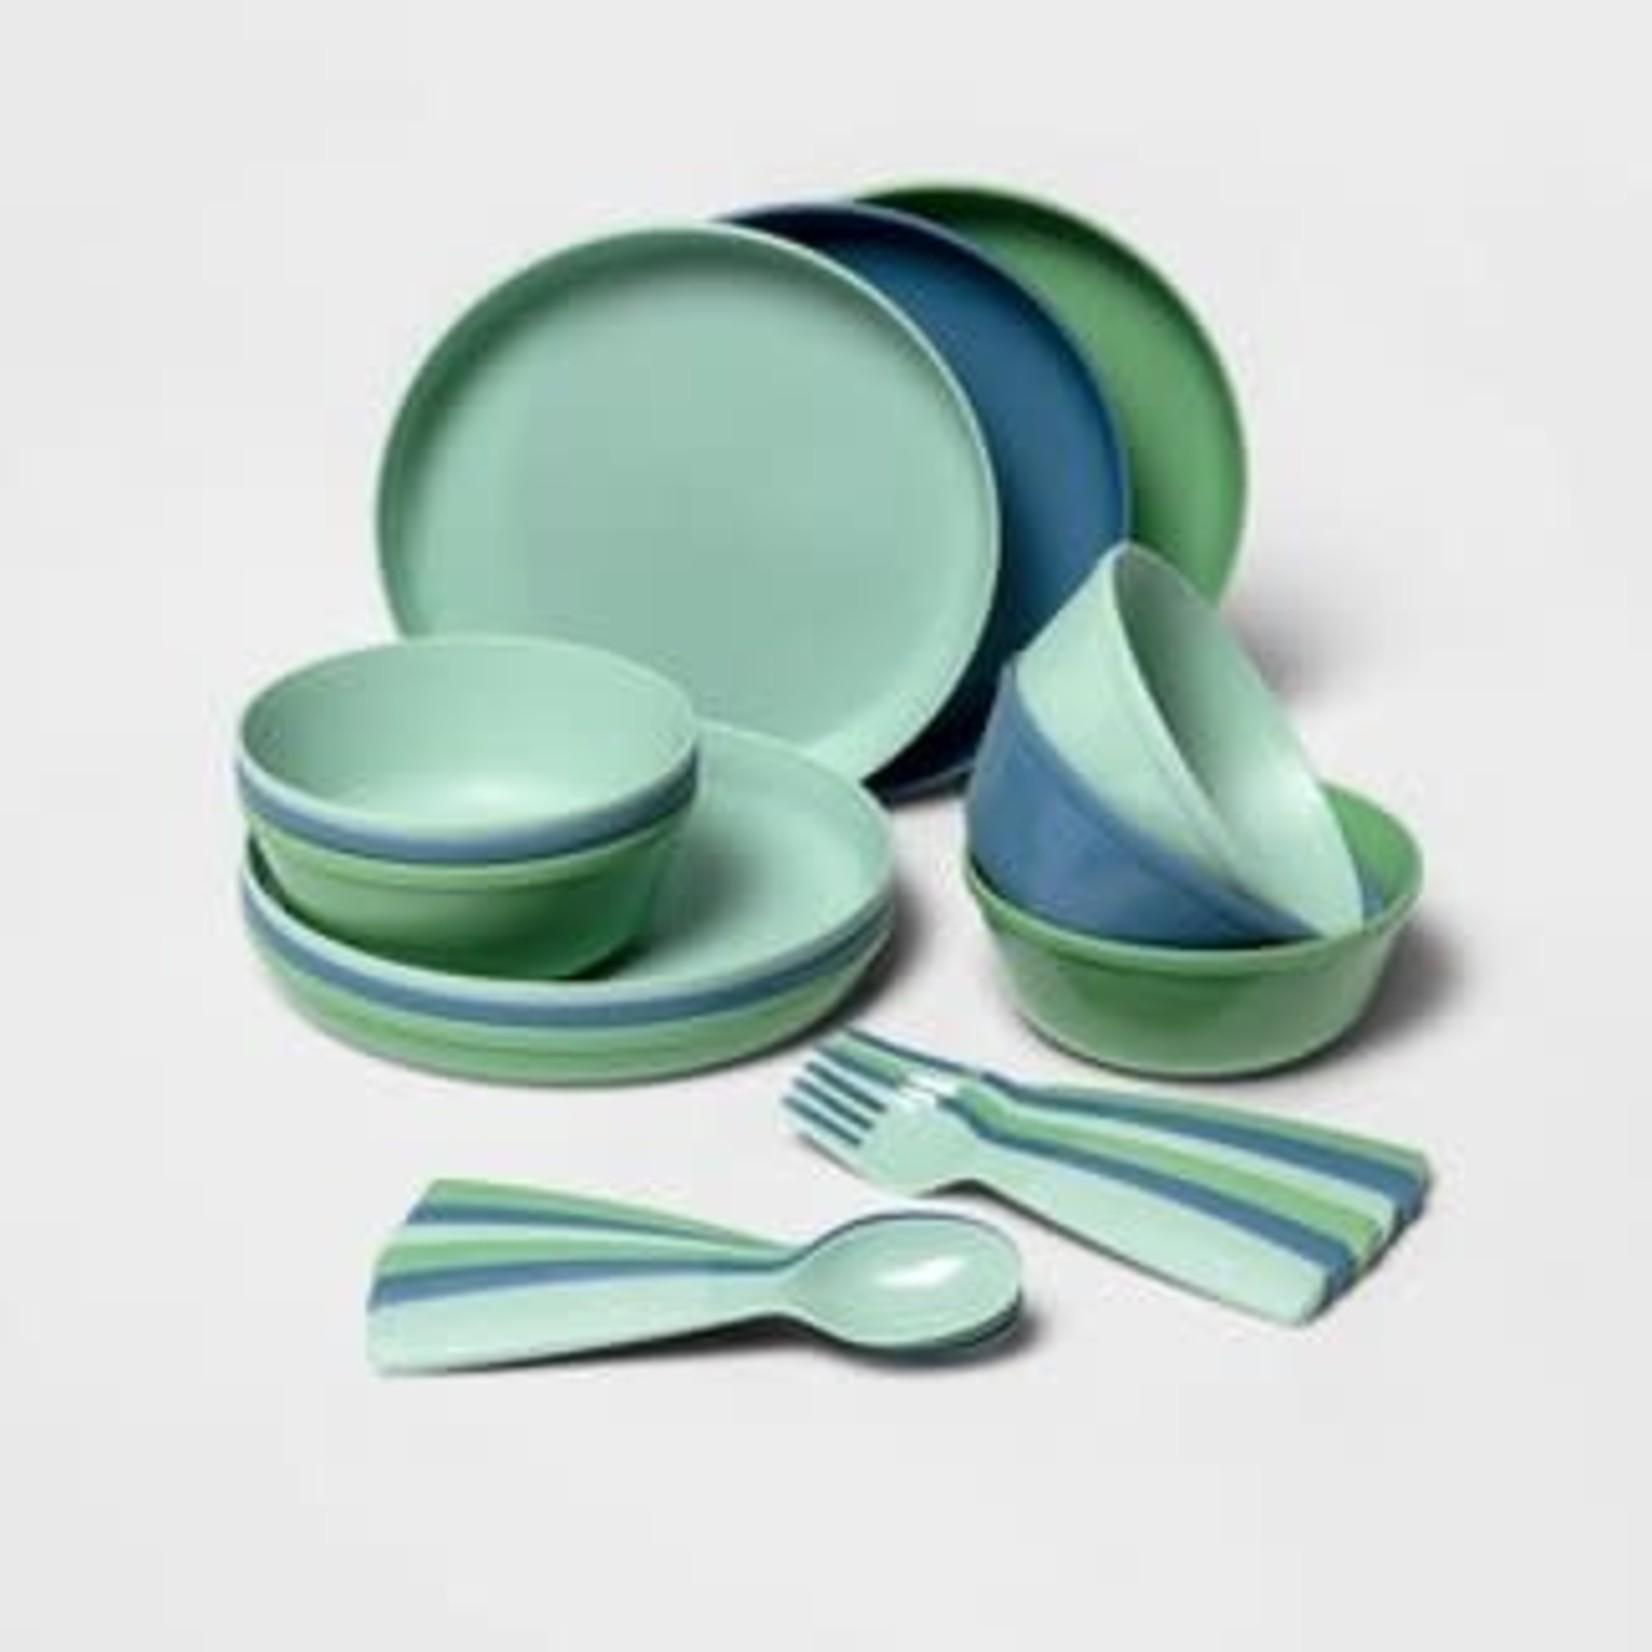 24pc Plastic Kids' Dinnerware Set - Pillowfort